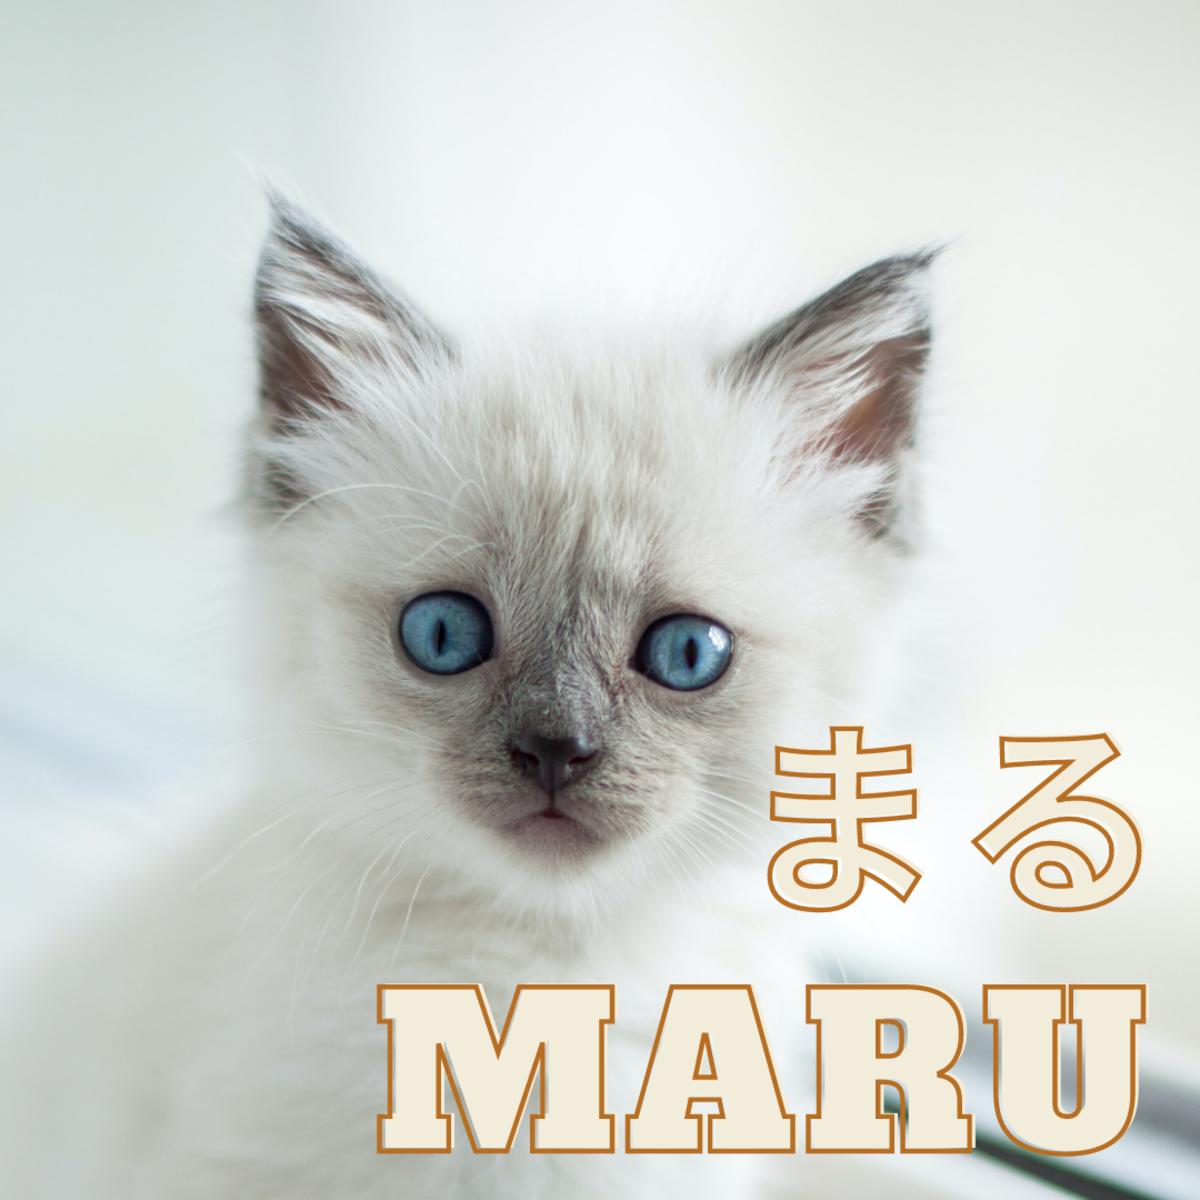 Maru or Circle